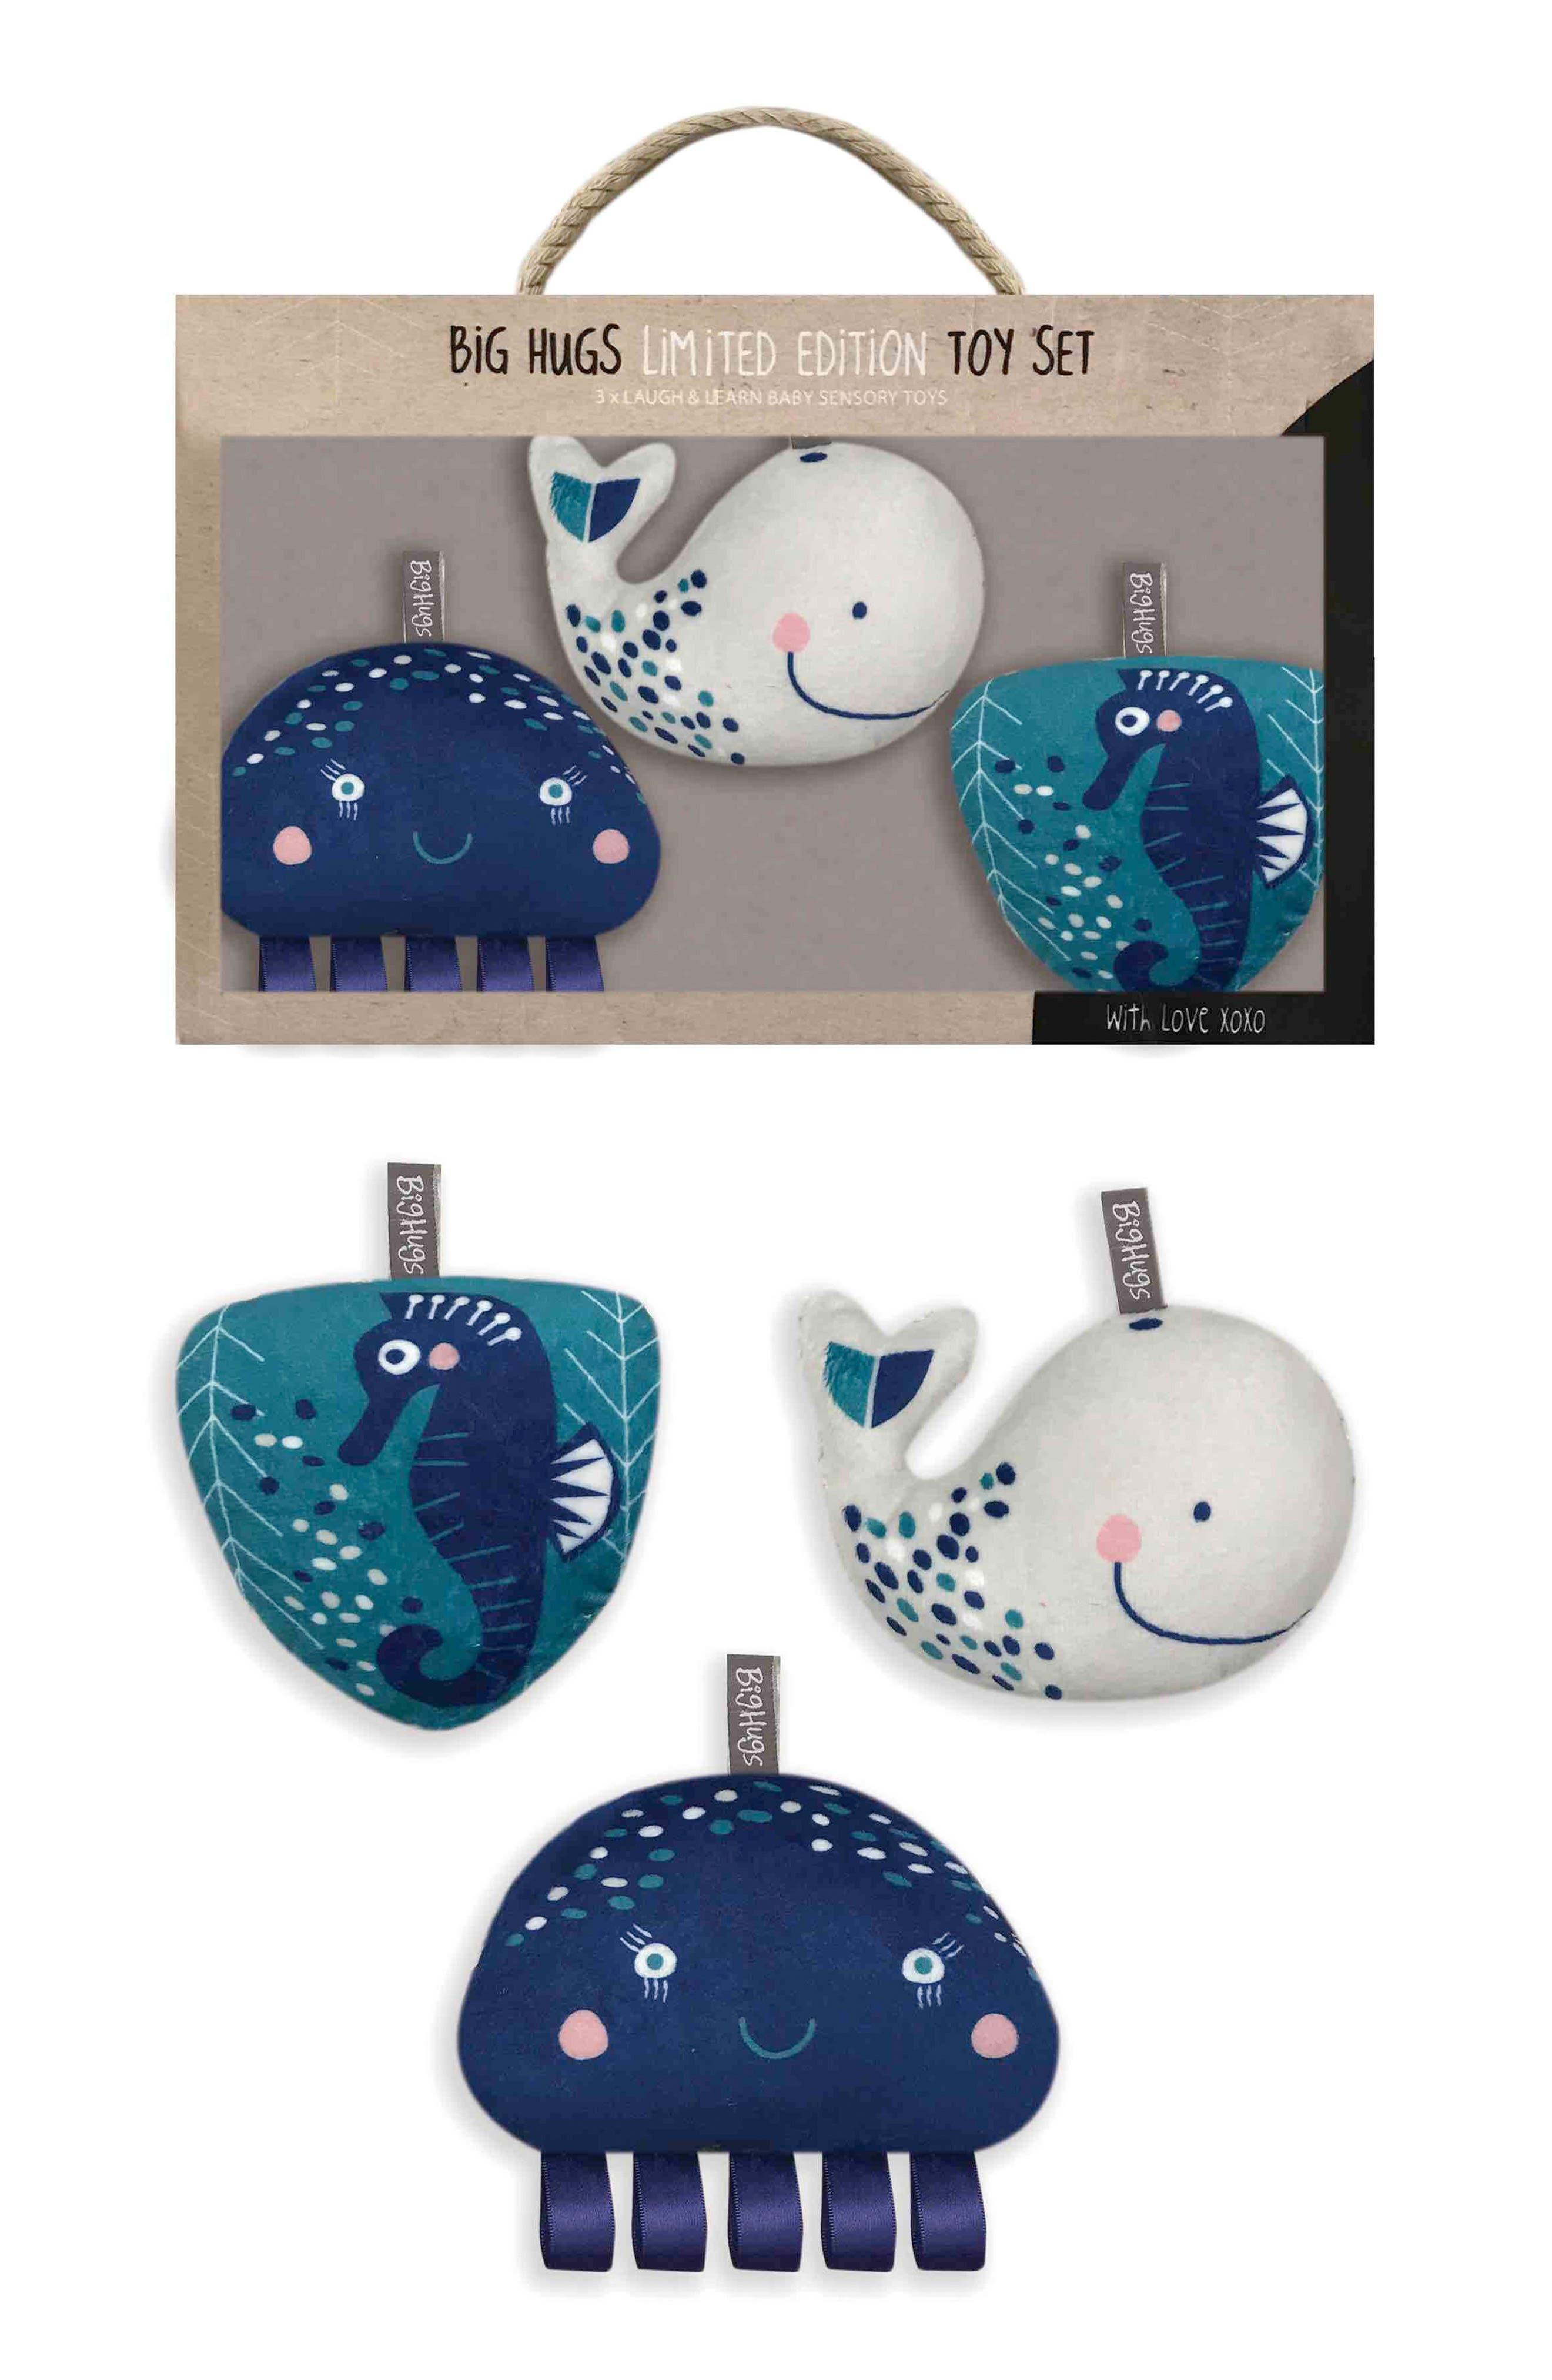 Whale of a Time Activity Plush Toy Set,                             Main thumbnail 1, color,                             INDIGO/ GREY/ WHITE